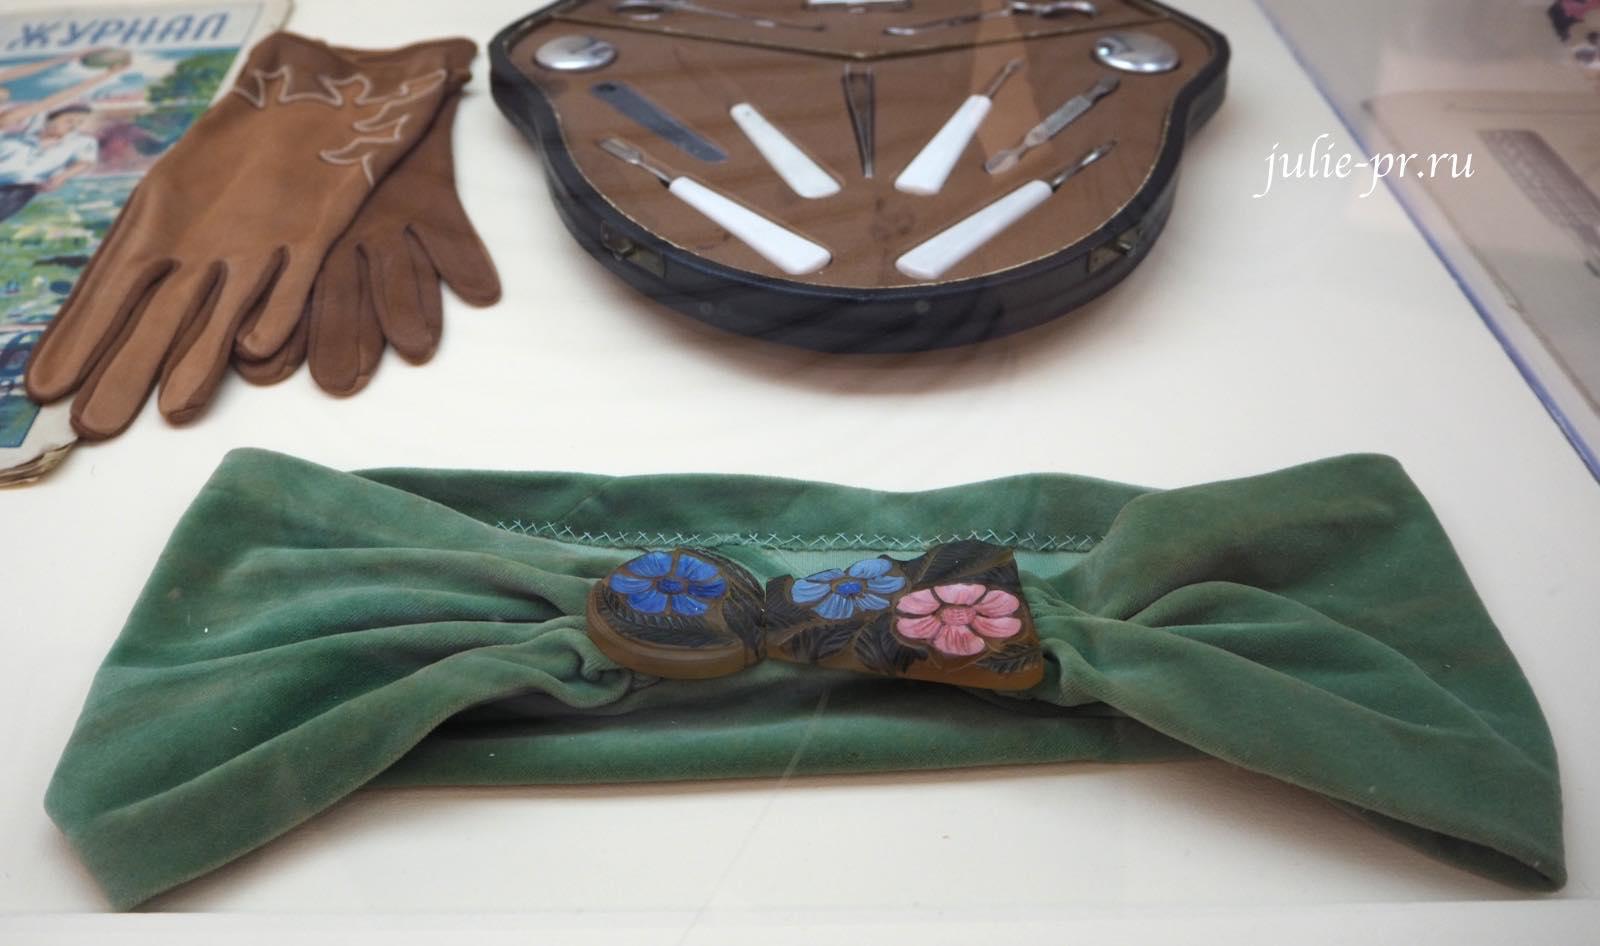 Весна и мода, выставка Александра Васильева, Москва, ВДНХ